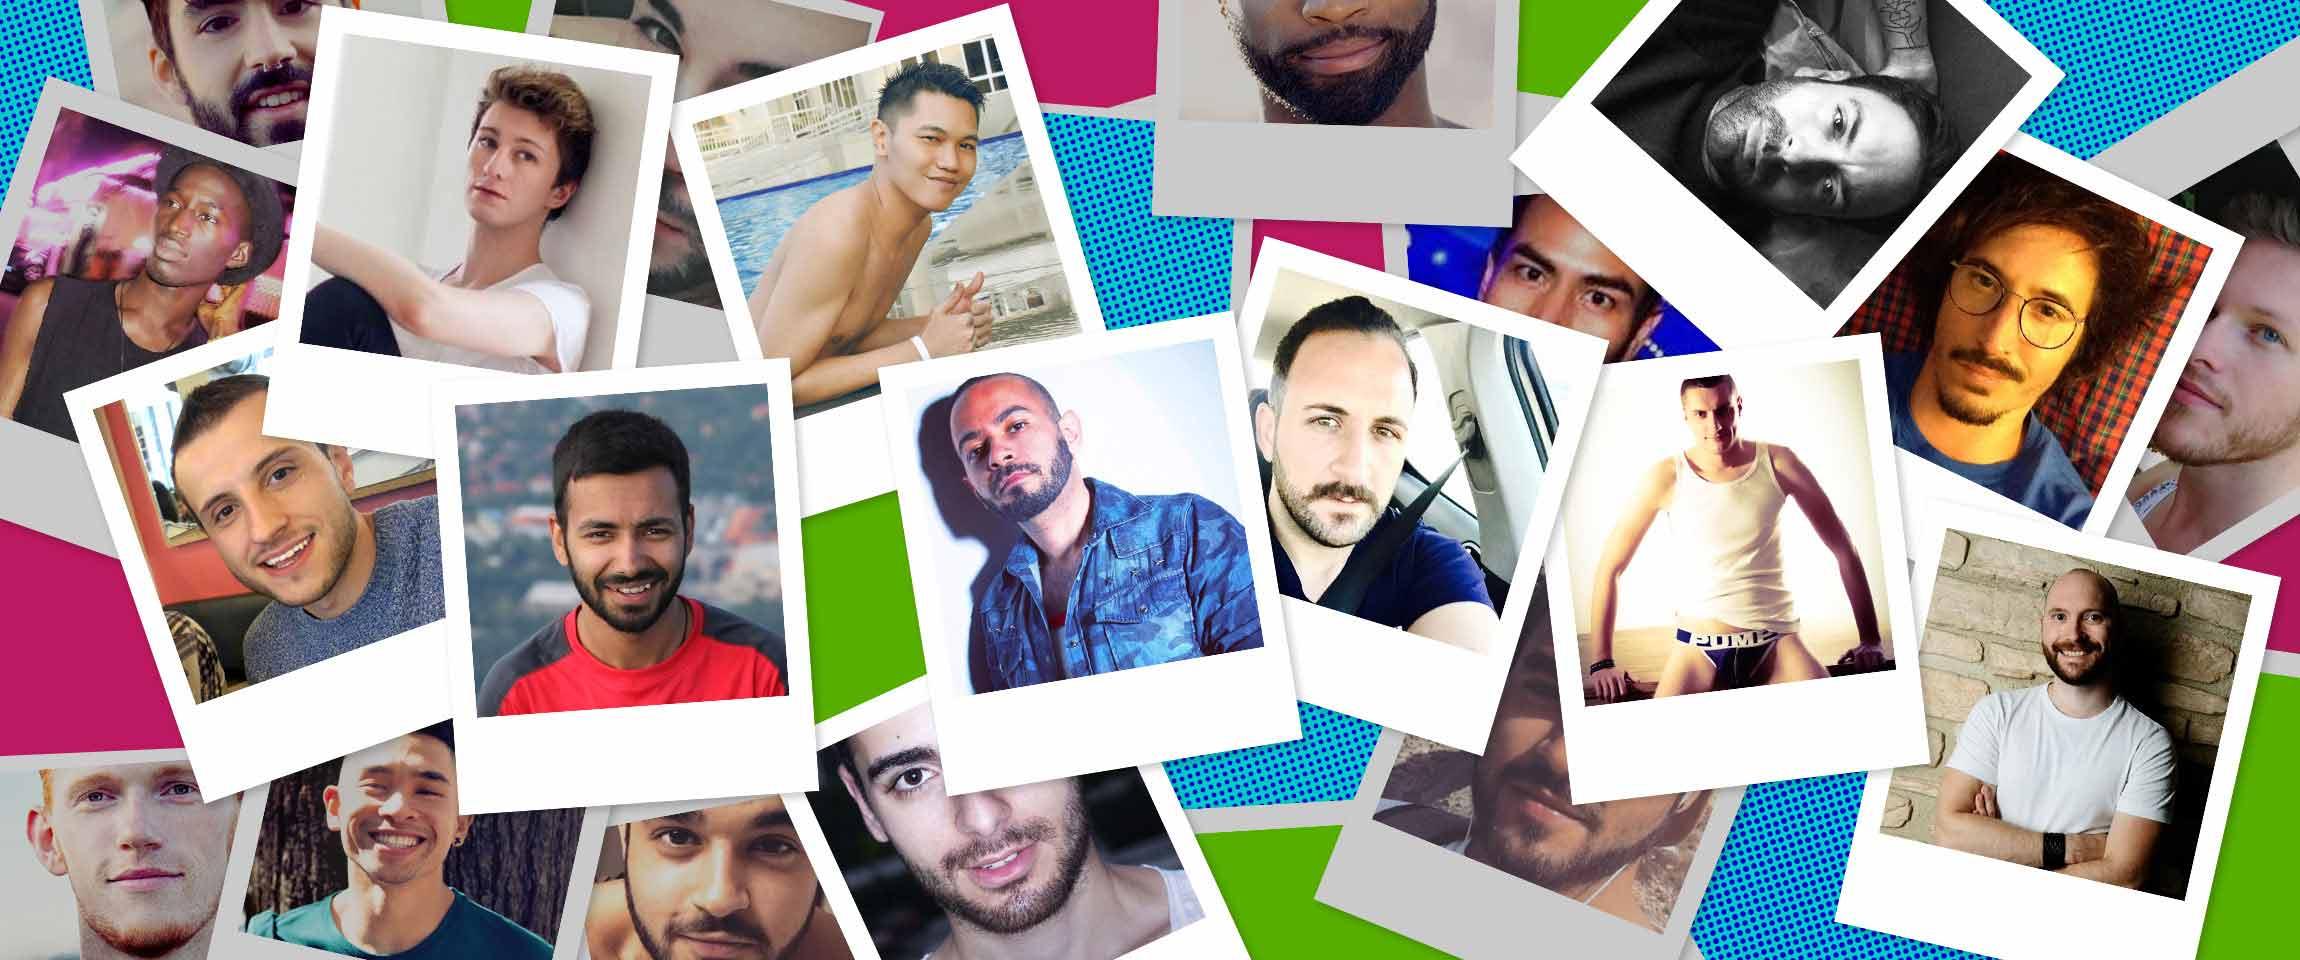 Gay Foot Fetish Tumblr throughout meet the romeo - planetromeo » planetromeo